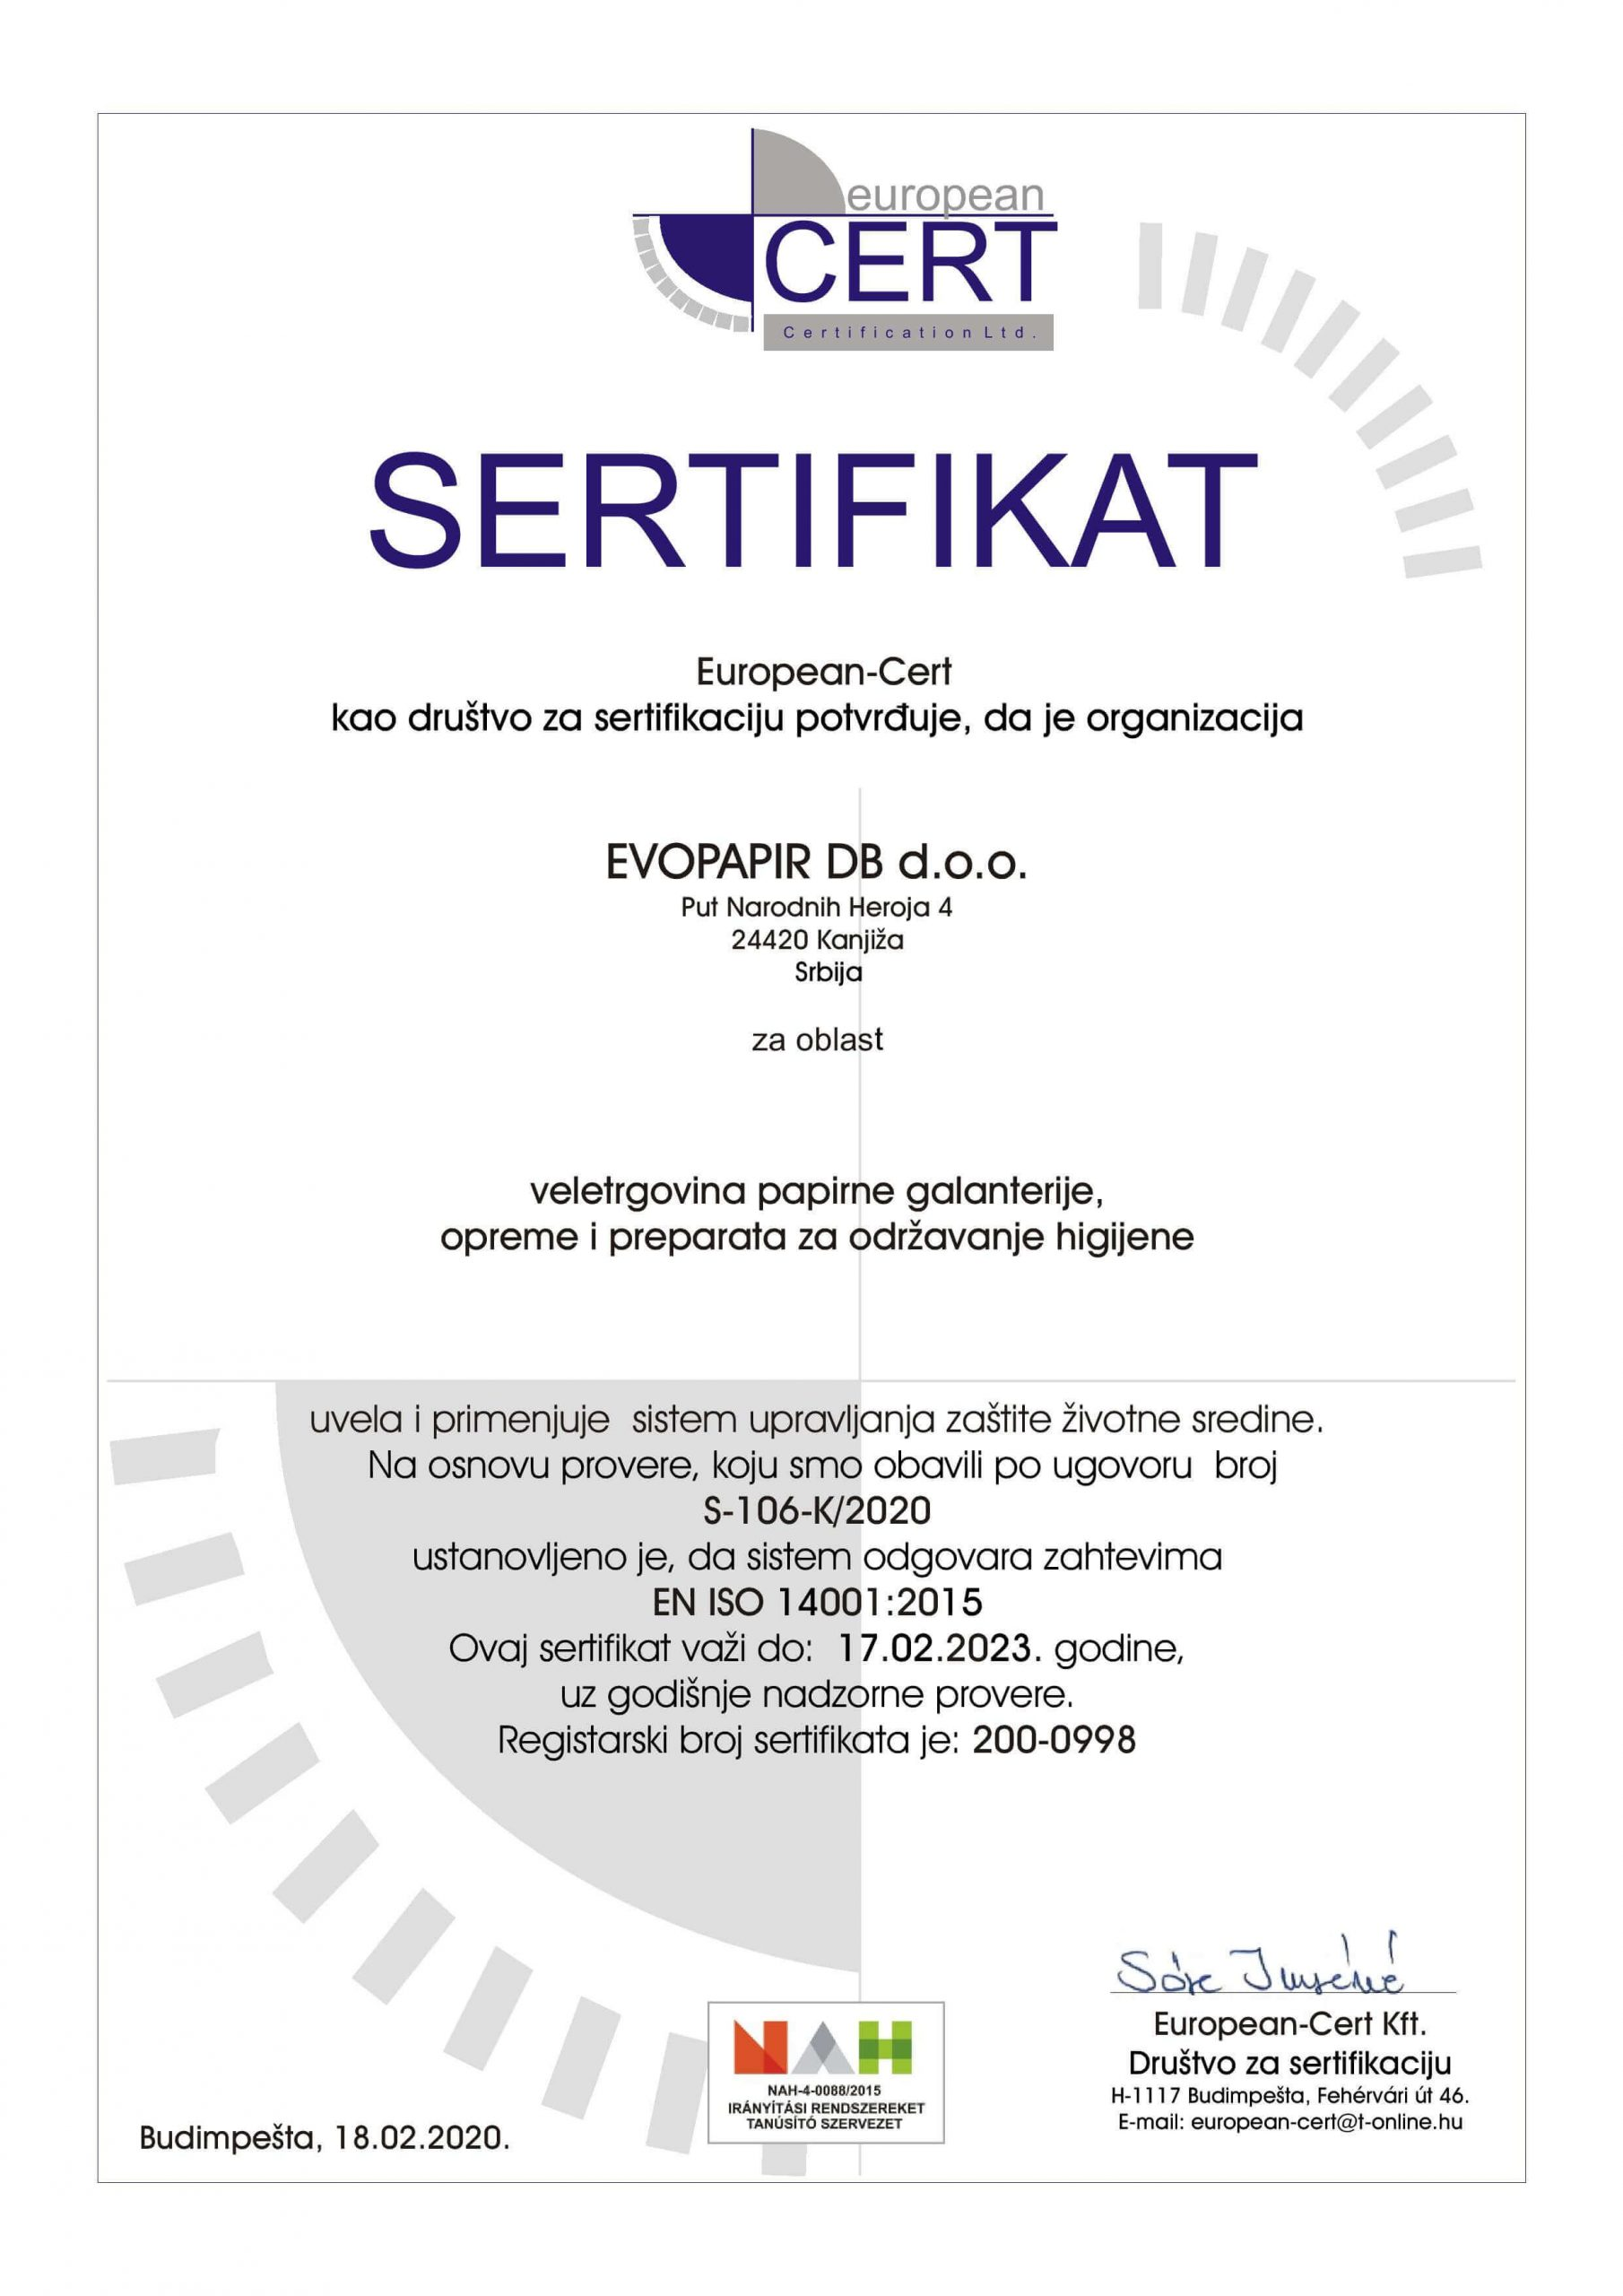 EVOPAPIR sertifikat zaštita životne sredine